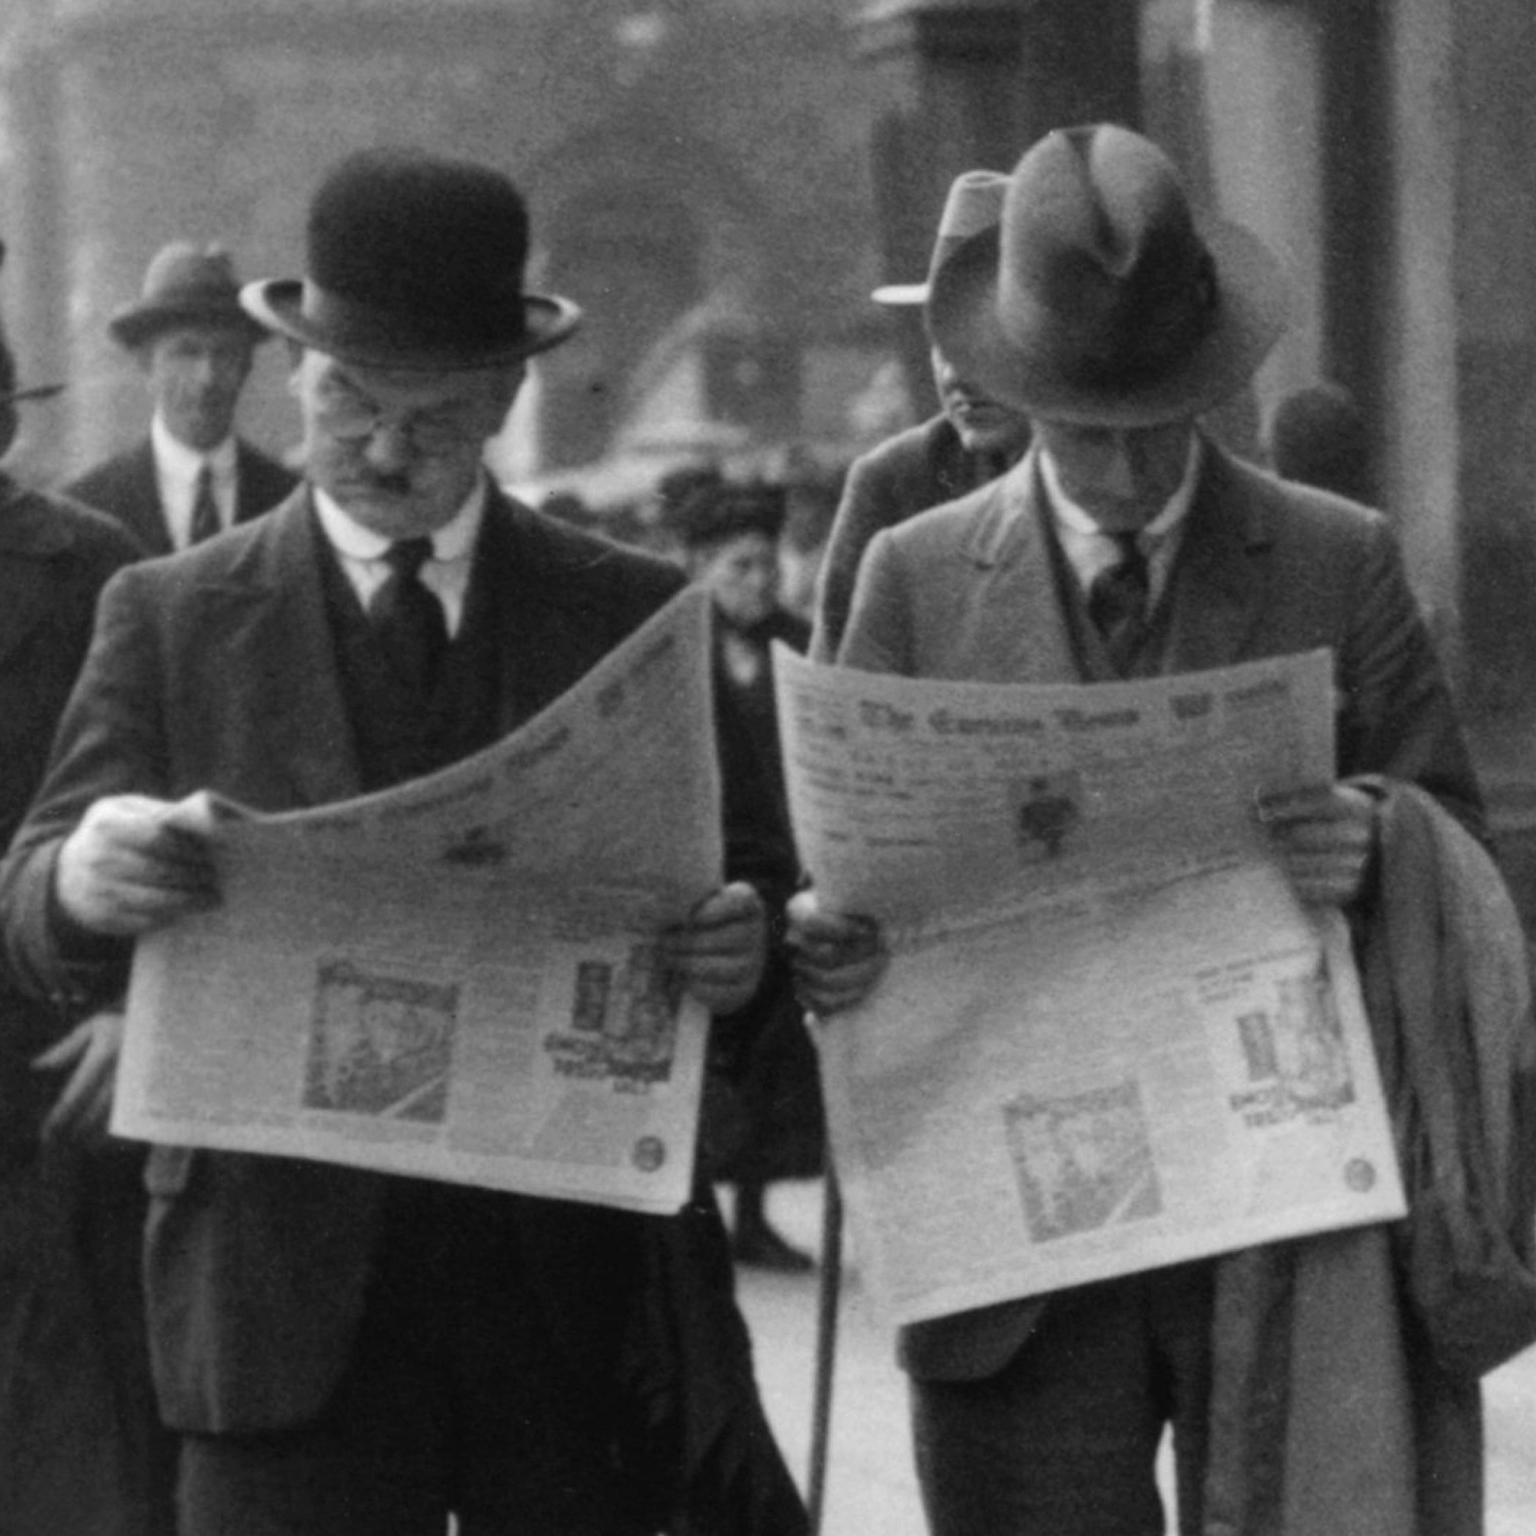 Men Reading Newspapers in London